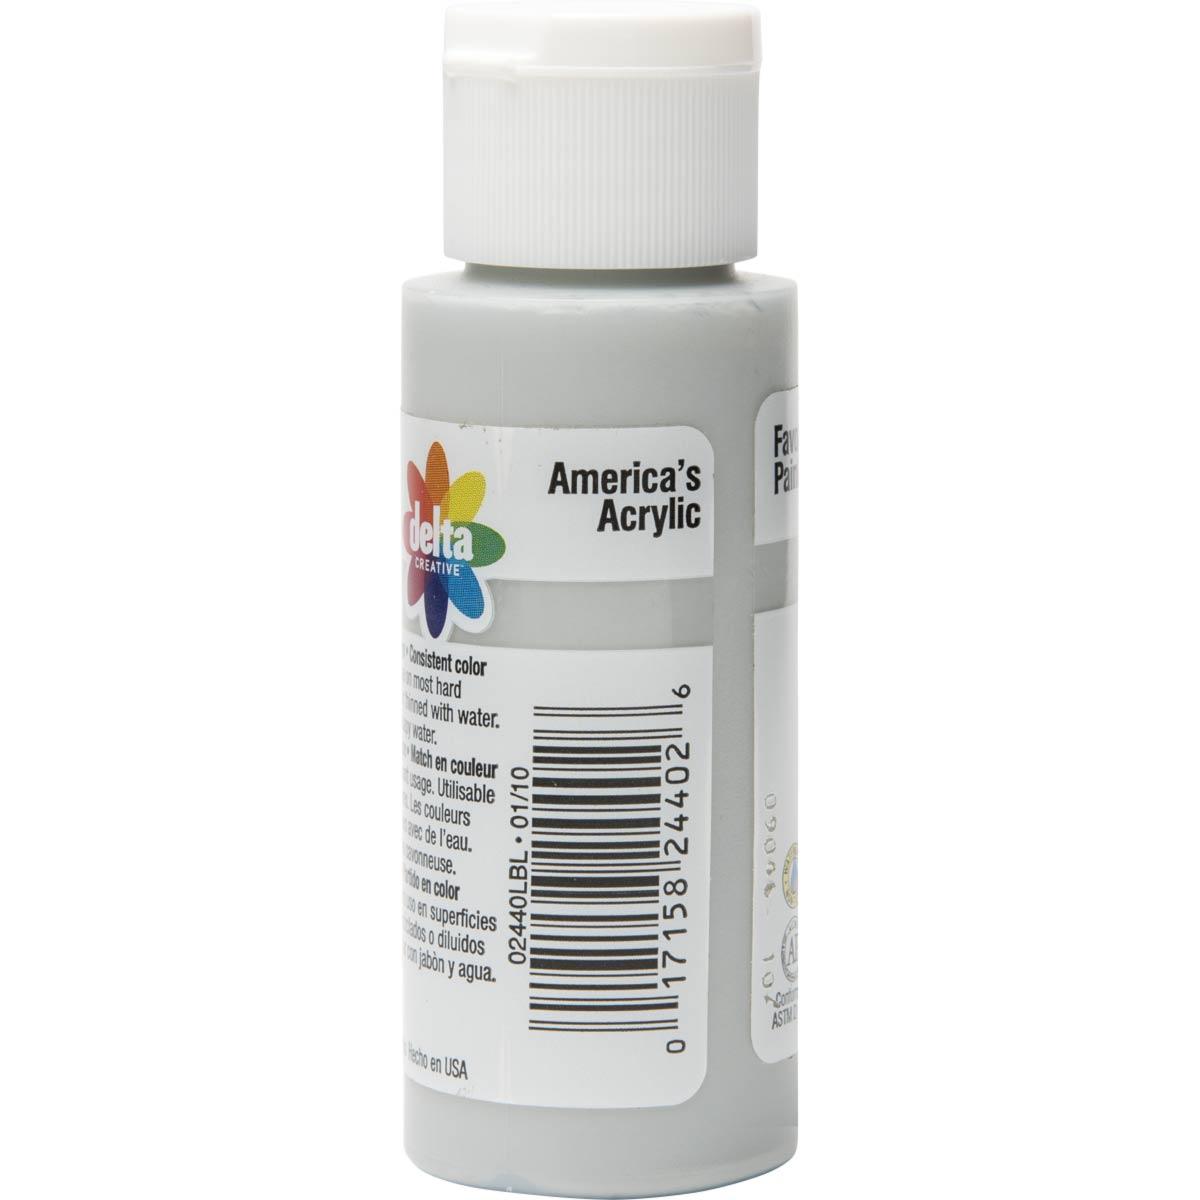 Delta Ceramcoat ® Acrylic Paint - Bridgeport Grey, 2 oz. - 024400202W